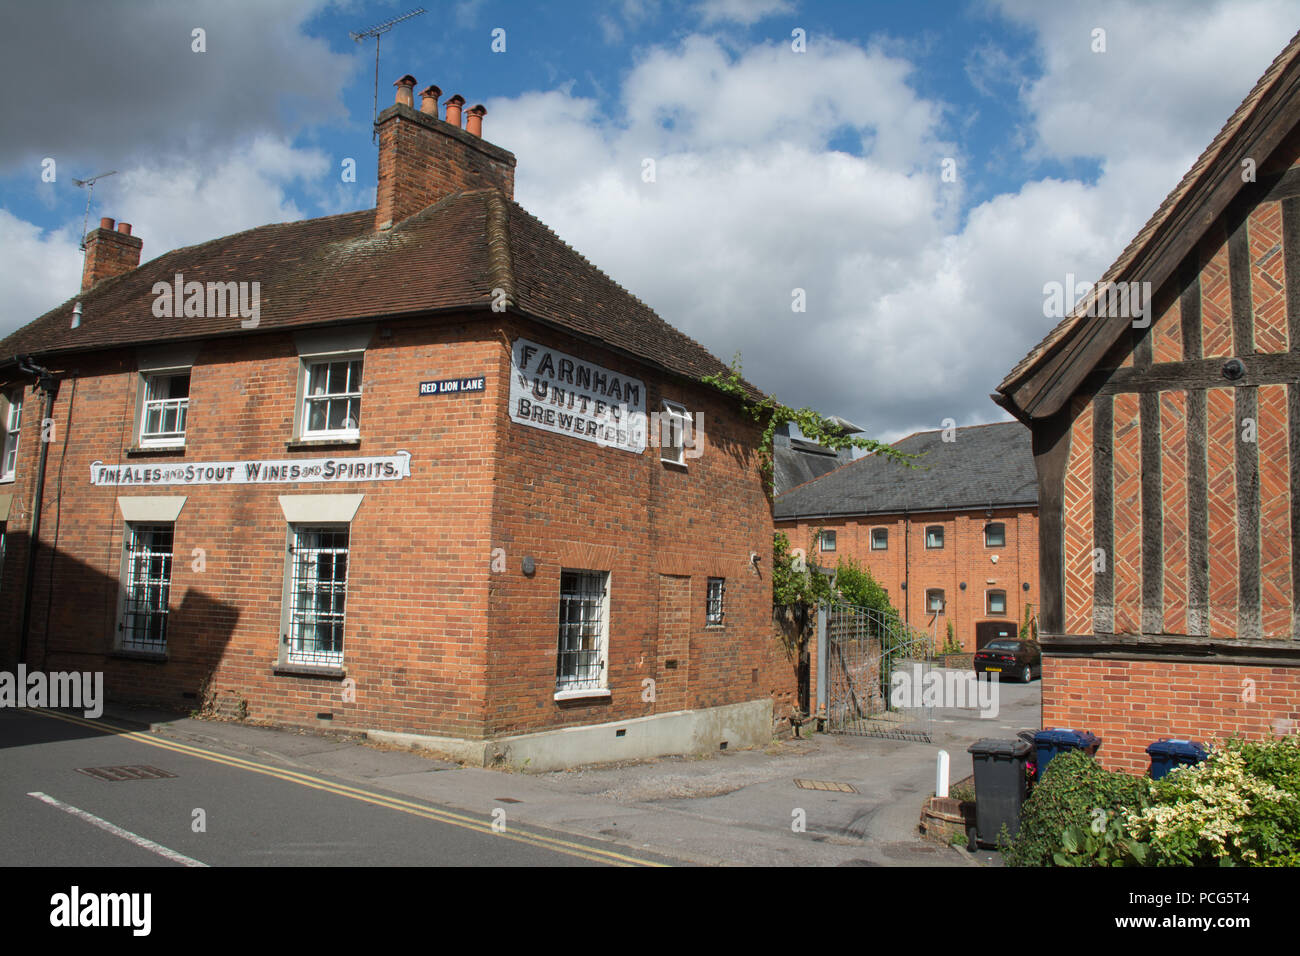 Farnham United Breweries old houses in Red Lion Lane, Farnham, Surrey, UK - Stock Image